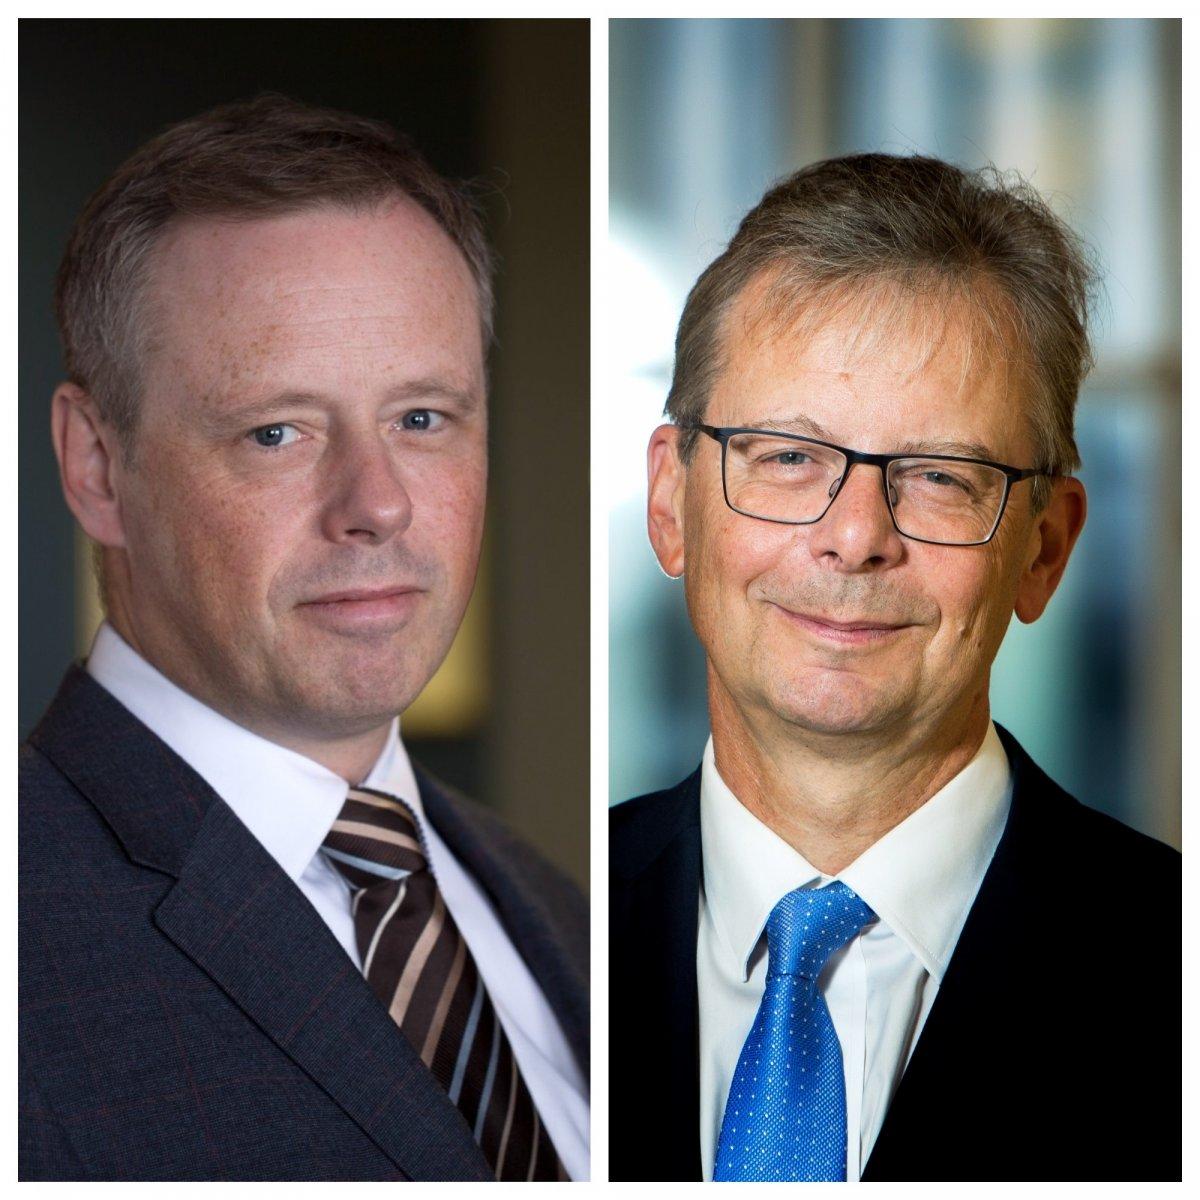 Páll Matthíasson og Jón Atli Benediktsson